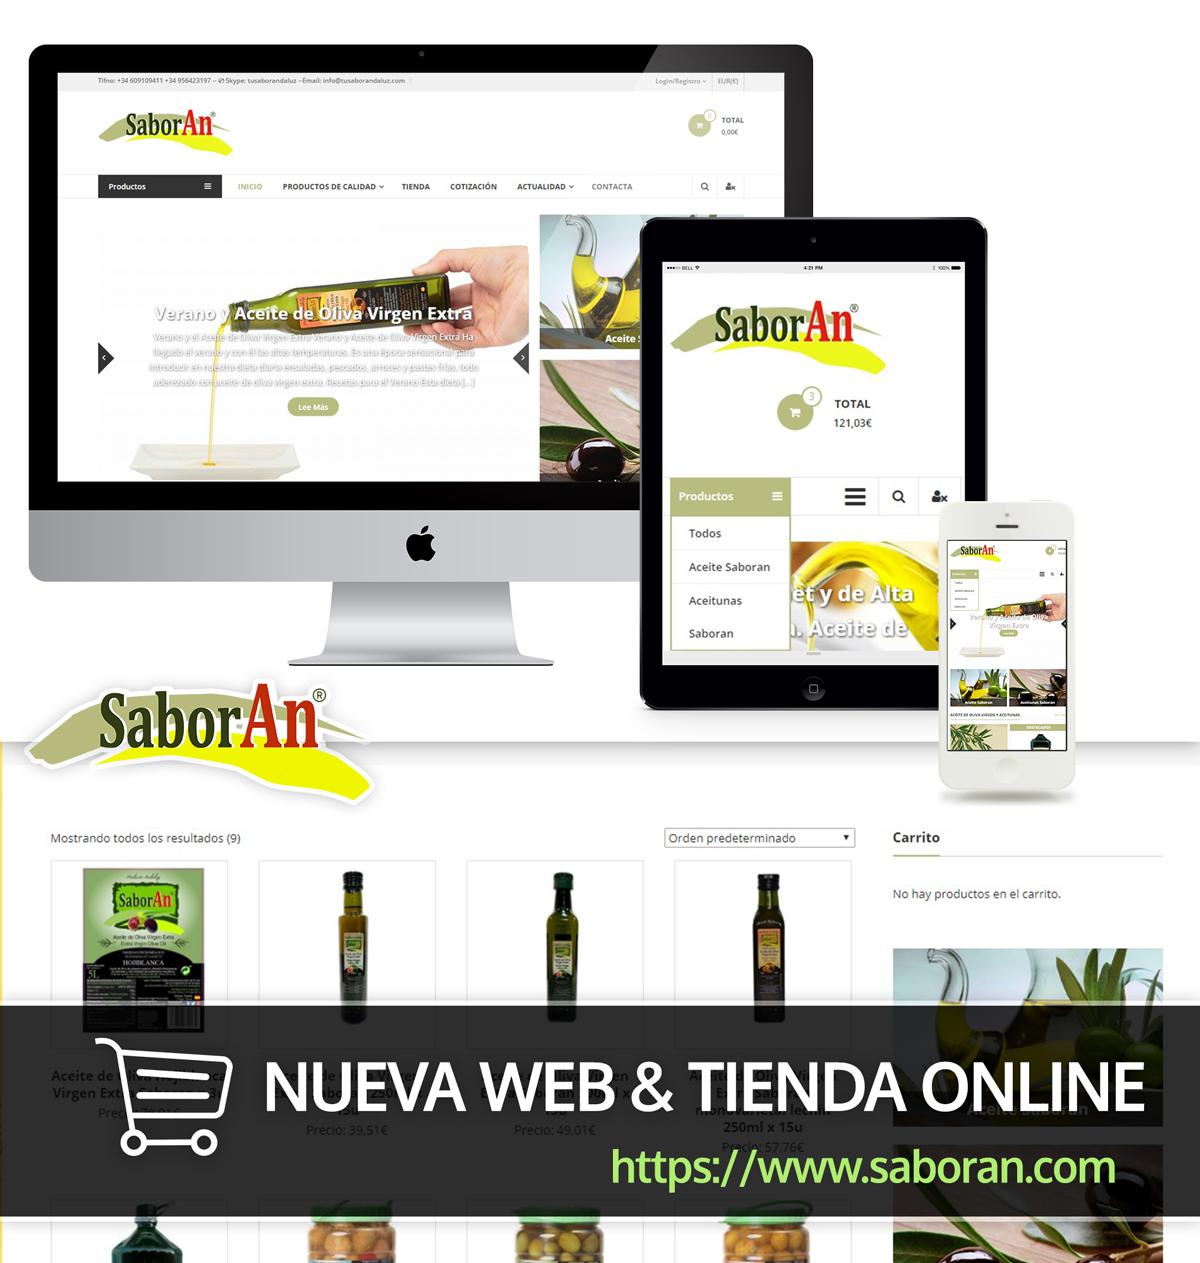 000b-saboran-tienda-online